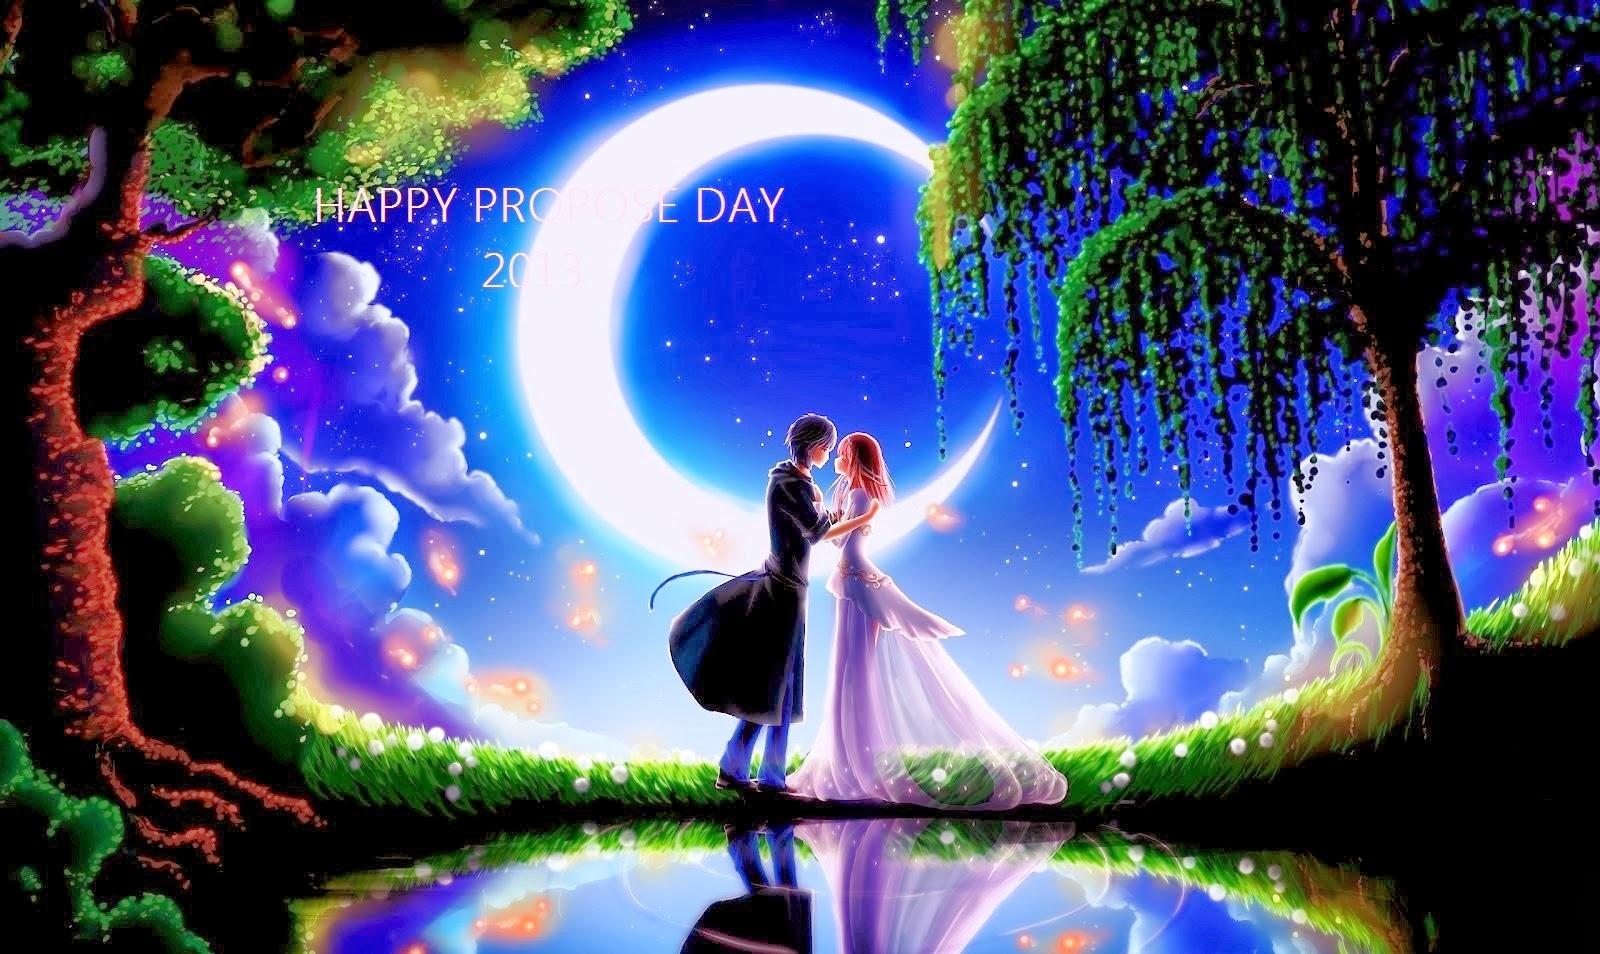 propose day special photos